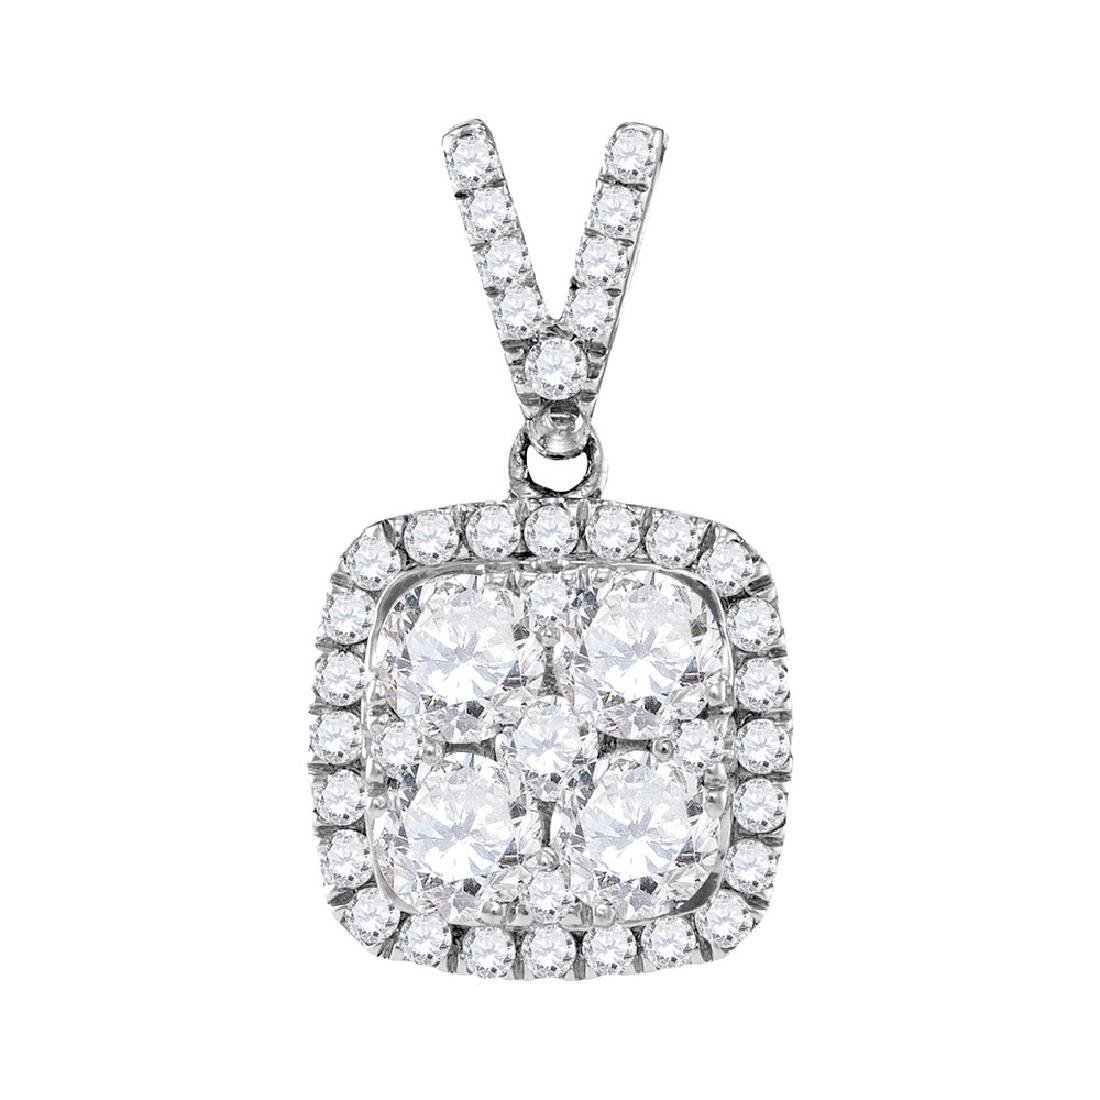 1.35 CTW Diamond Square Cluster Pendant 10KT White Gold